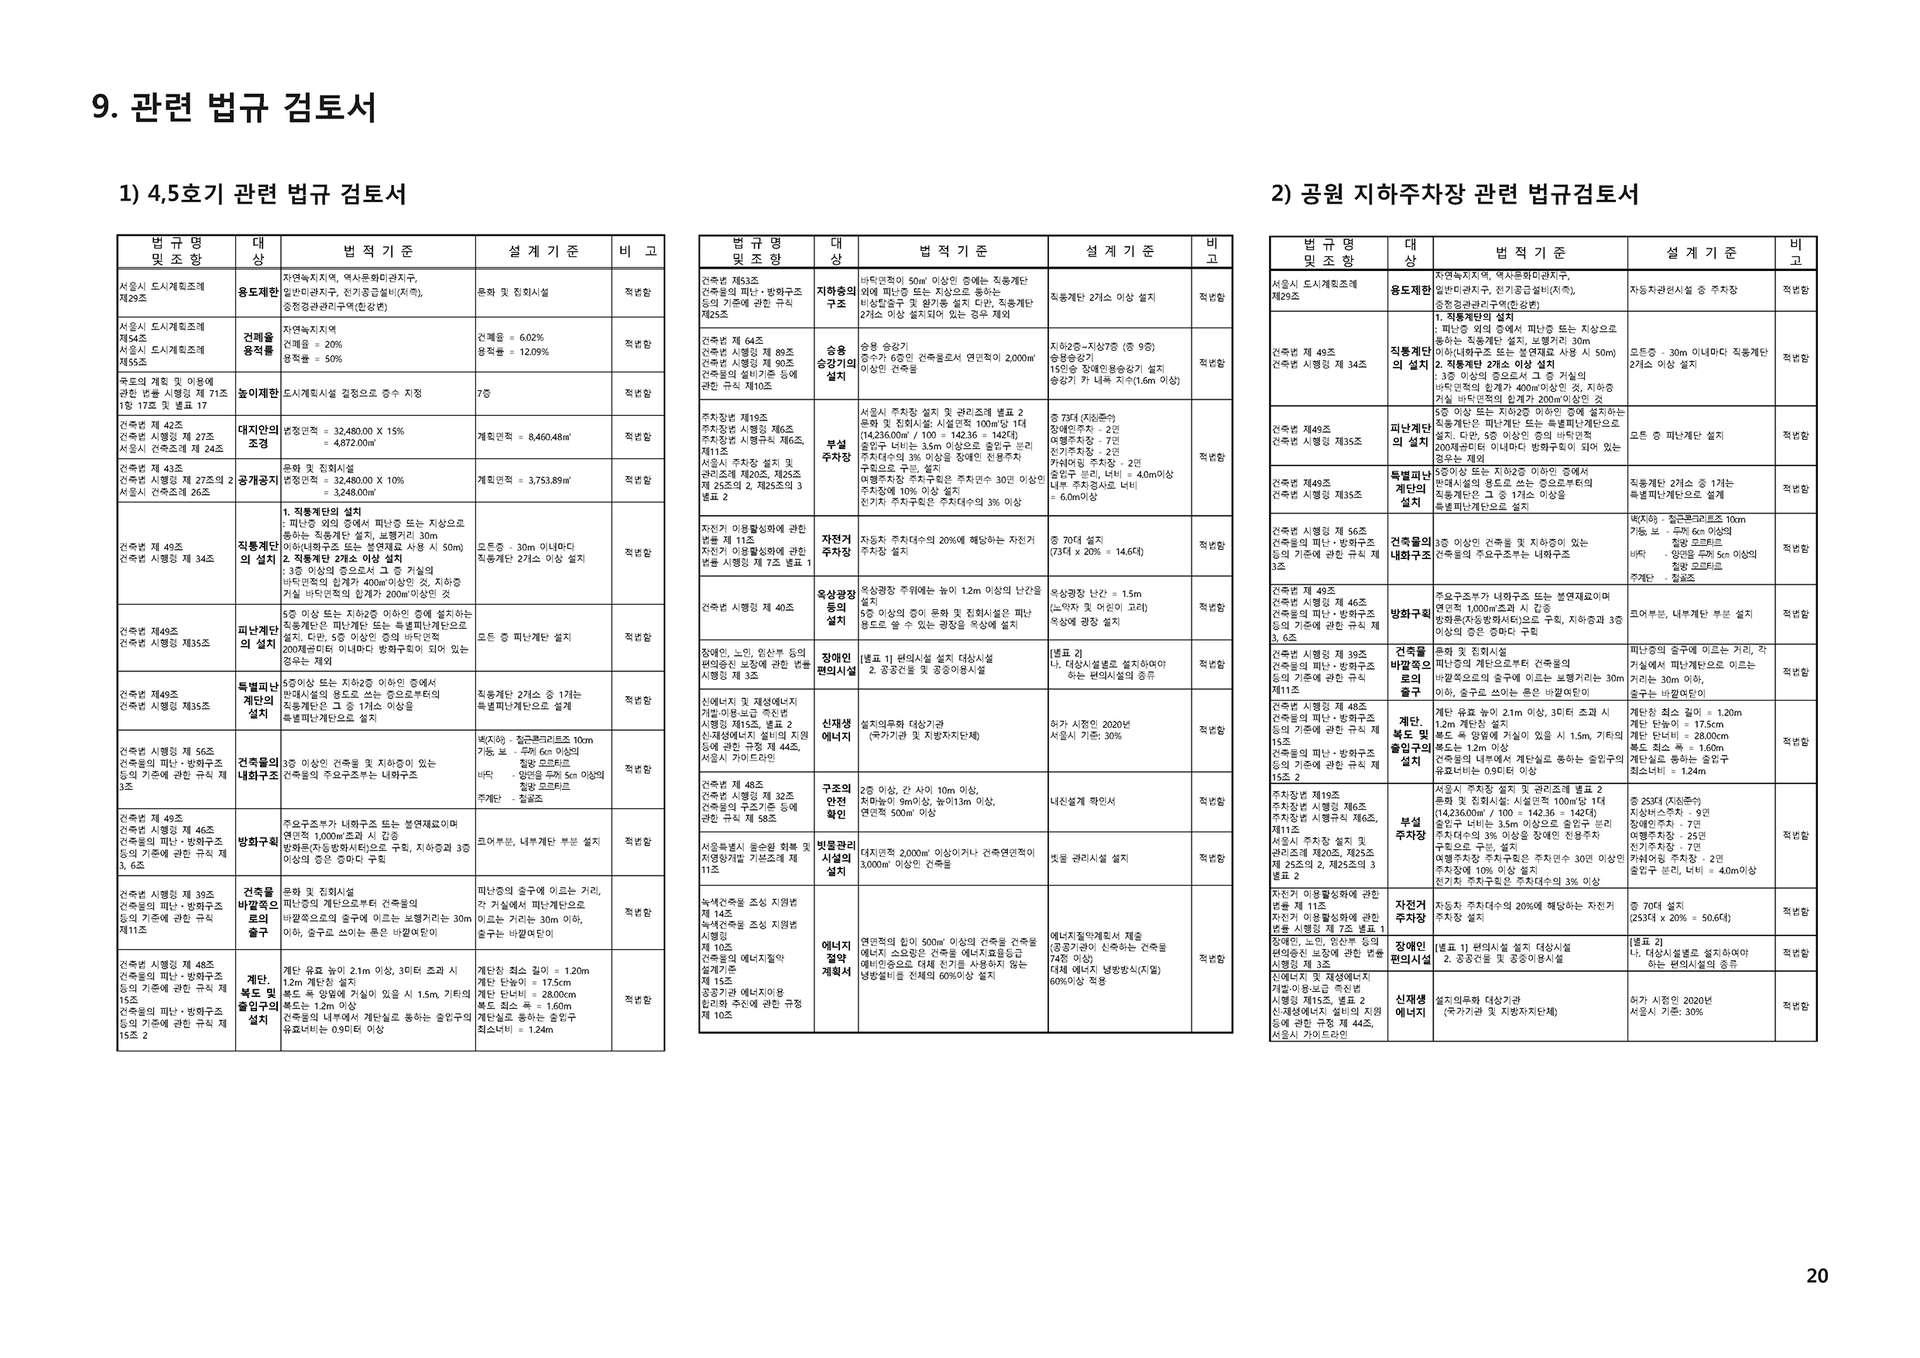 181210_Description_v_페이지_20.jpg